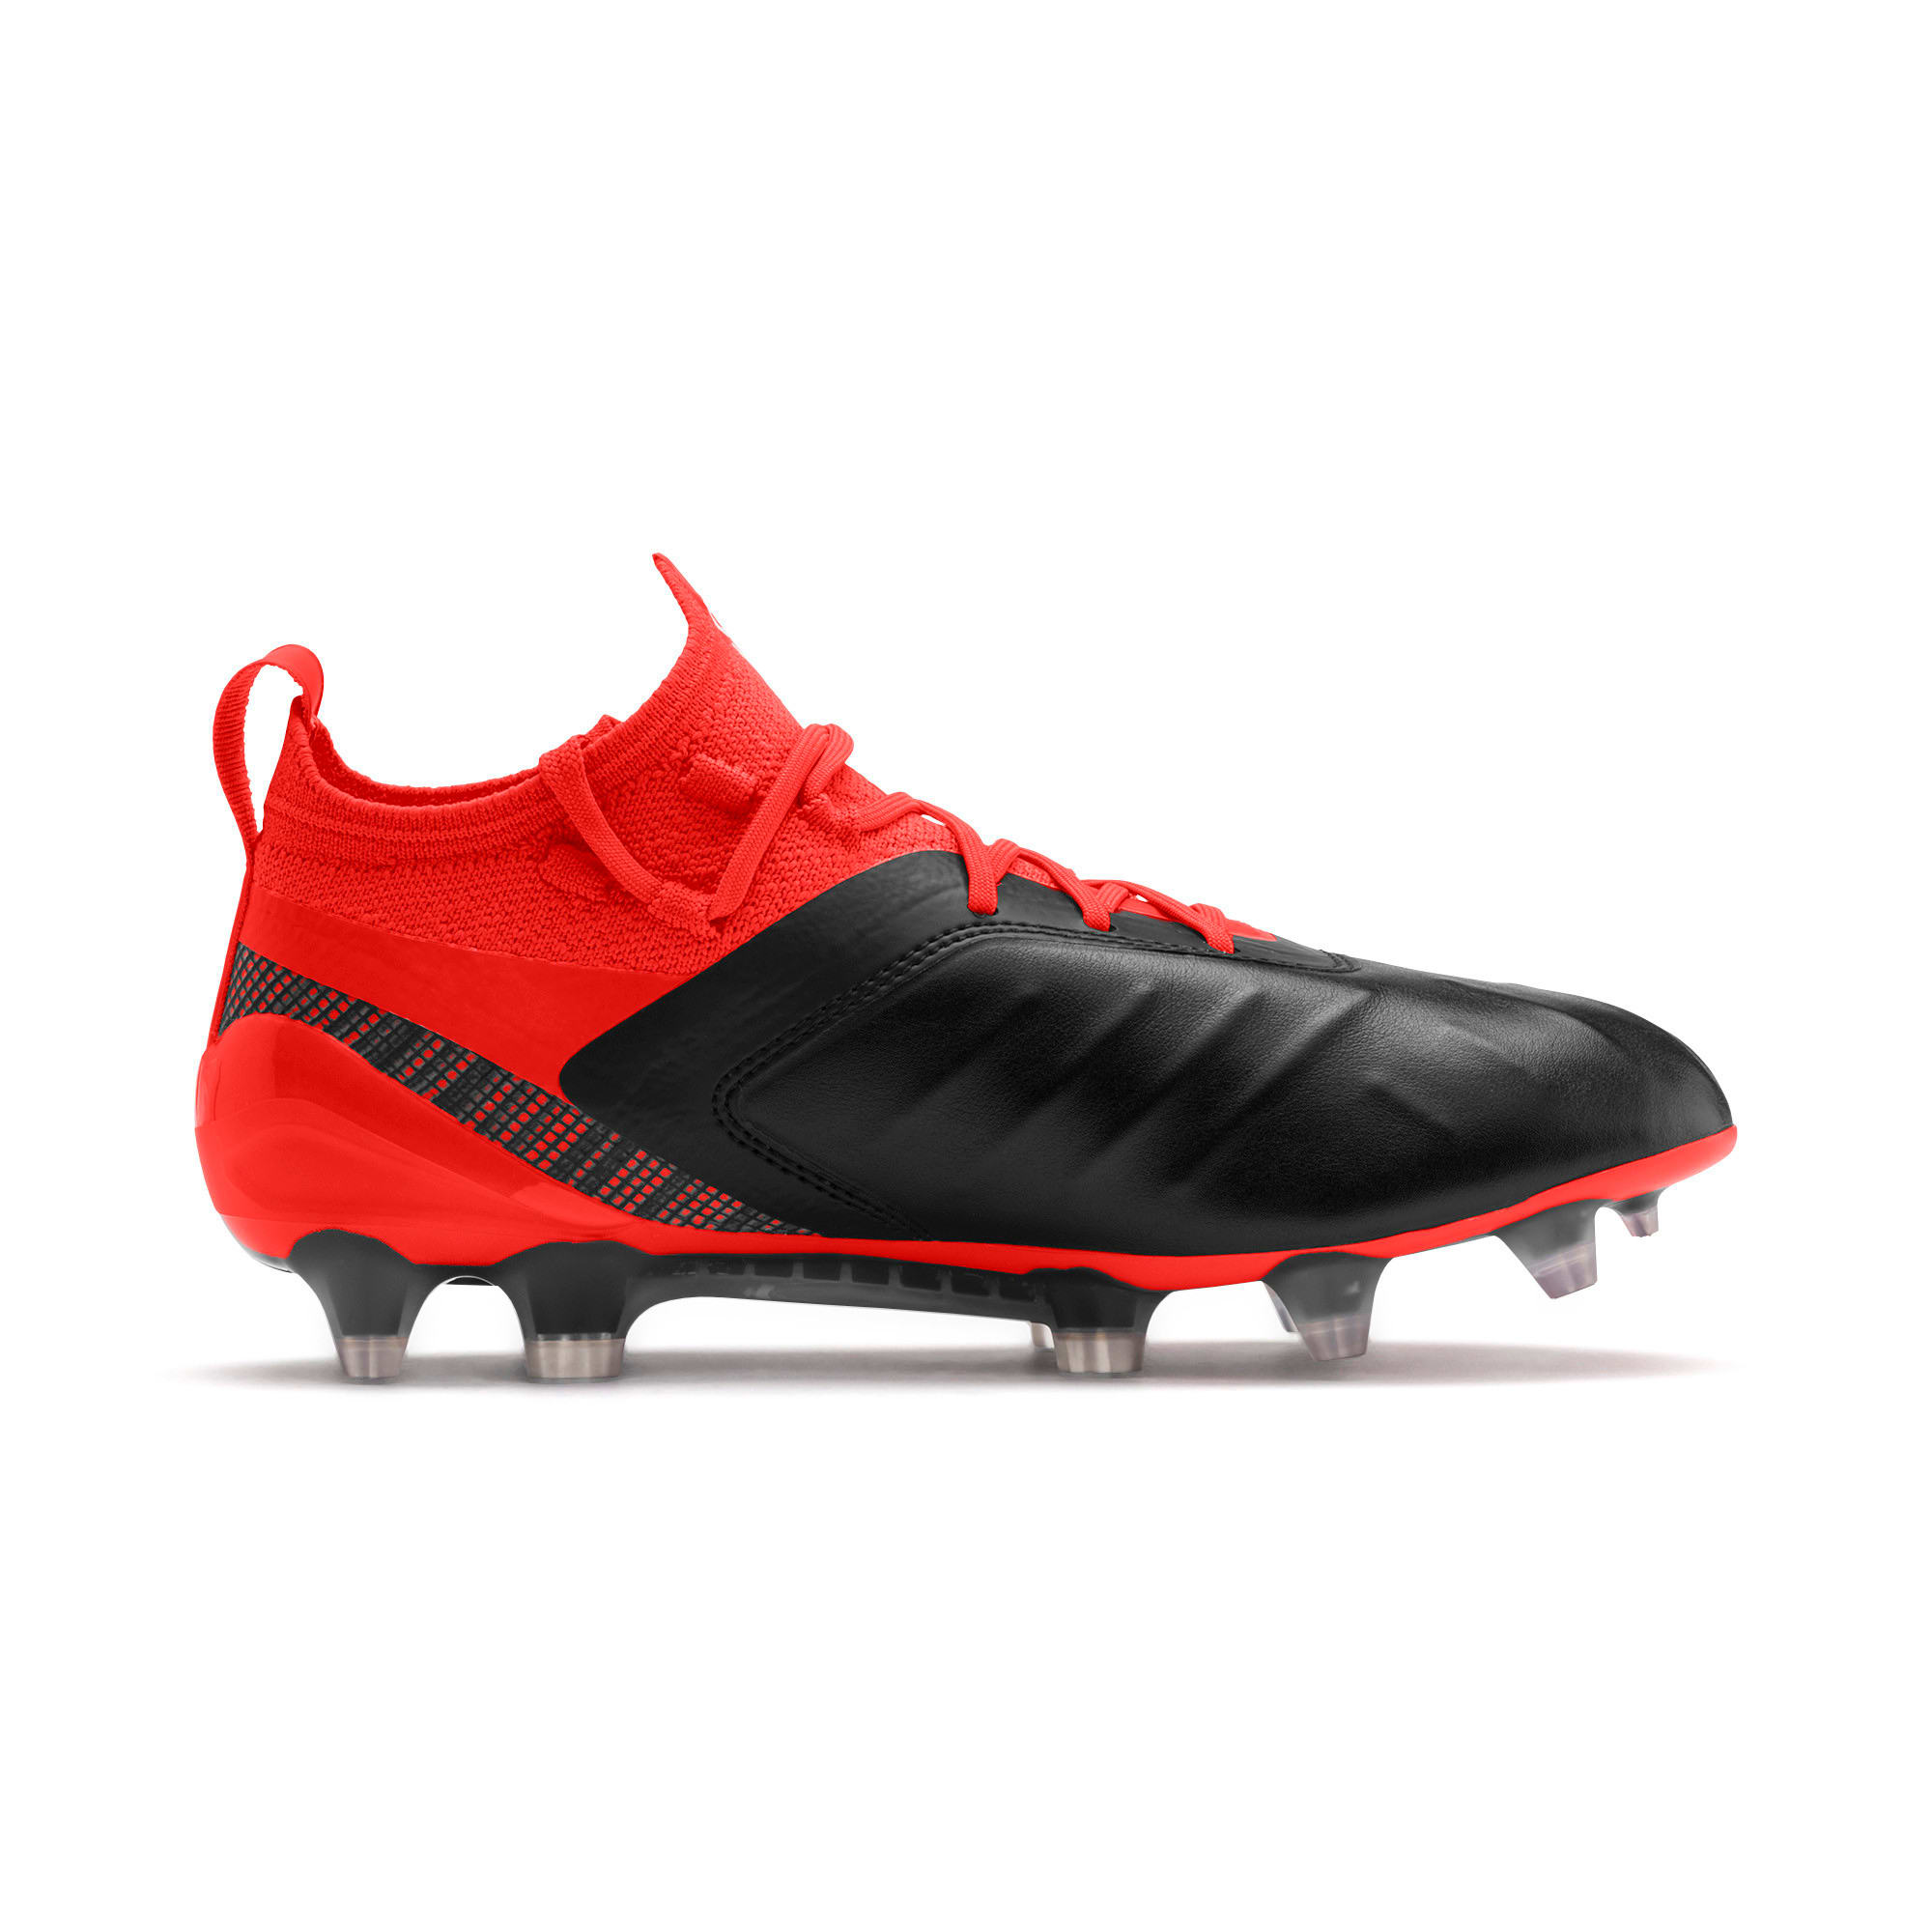 Thumbnail 5 of PUMA ONE 5.1 FG/AG Soccer Cleats JR, Black-Nrgy Red-Aged Silver, medium